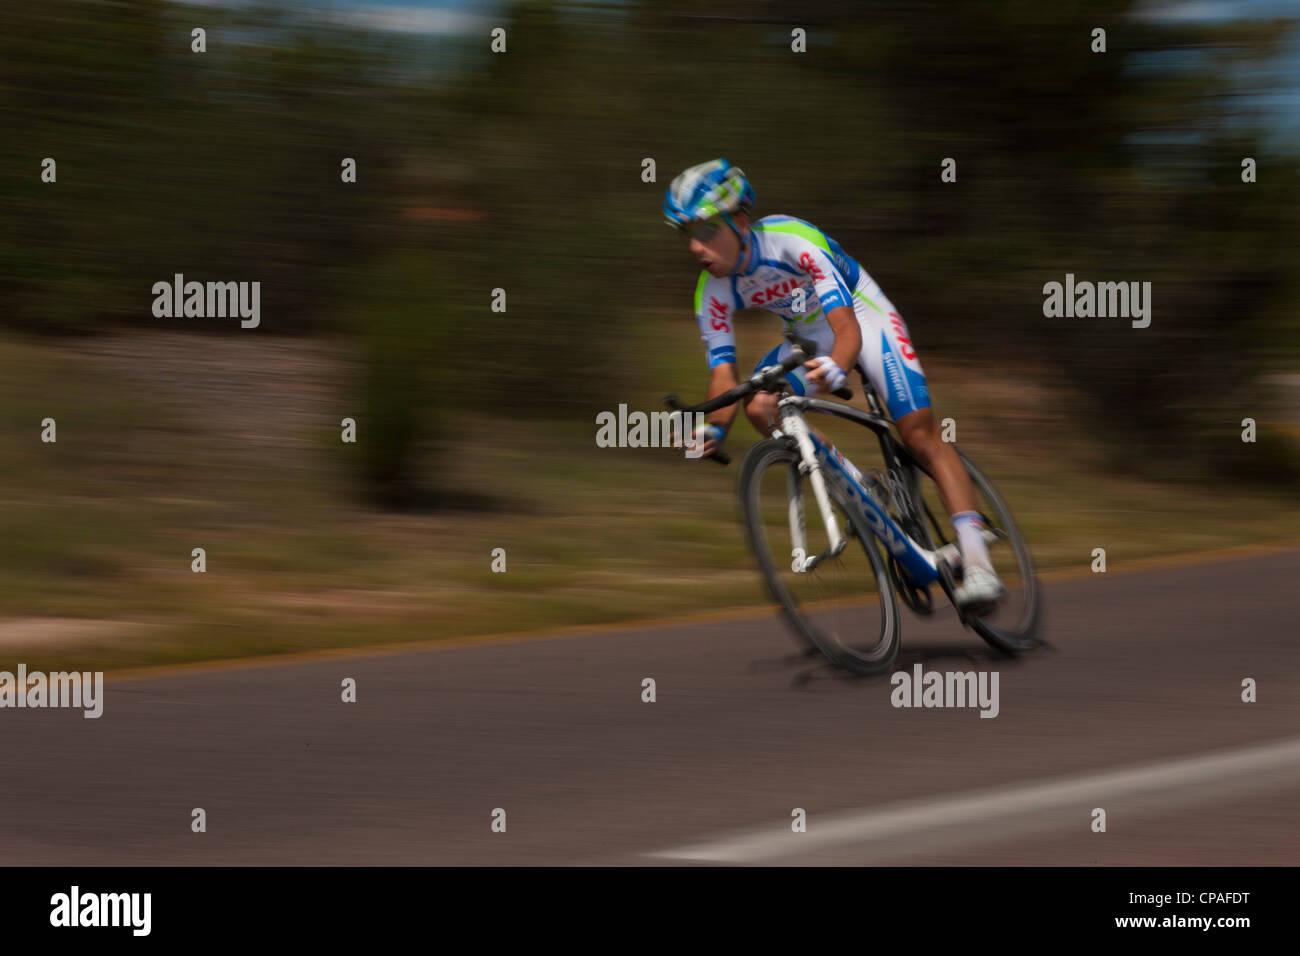 USA, Colorado, Colorado Springs, Garden of the Gods. Thomas Bonnin,competes in the inaugural 2011 USA Pro Cycling - Stock Image